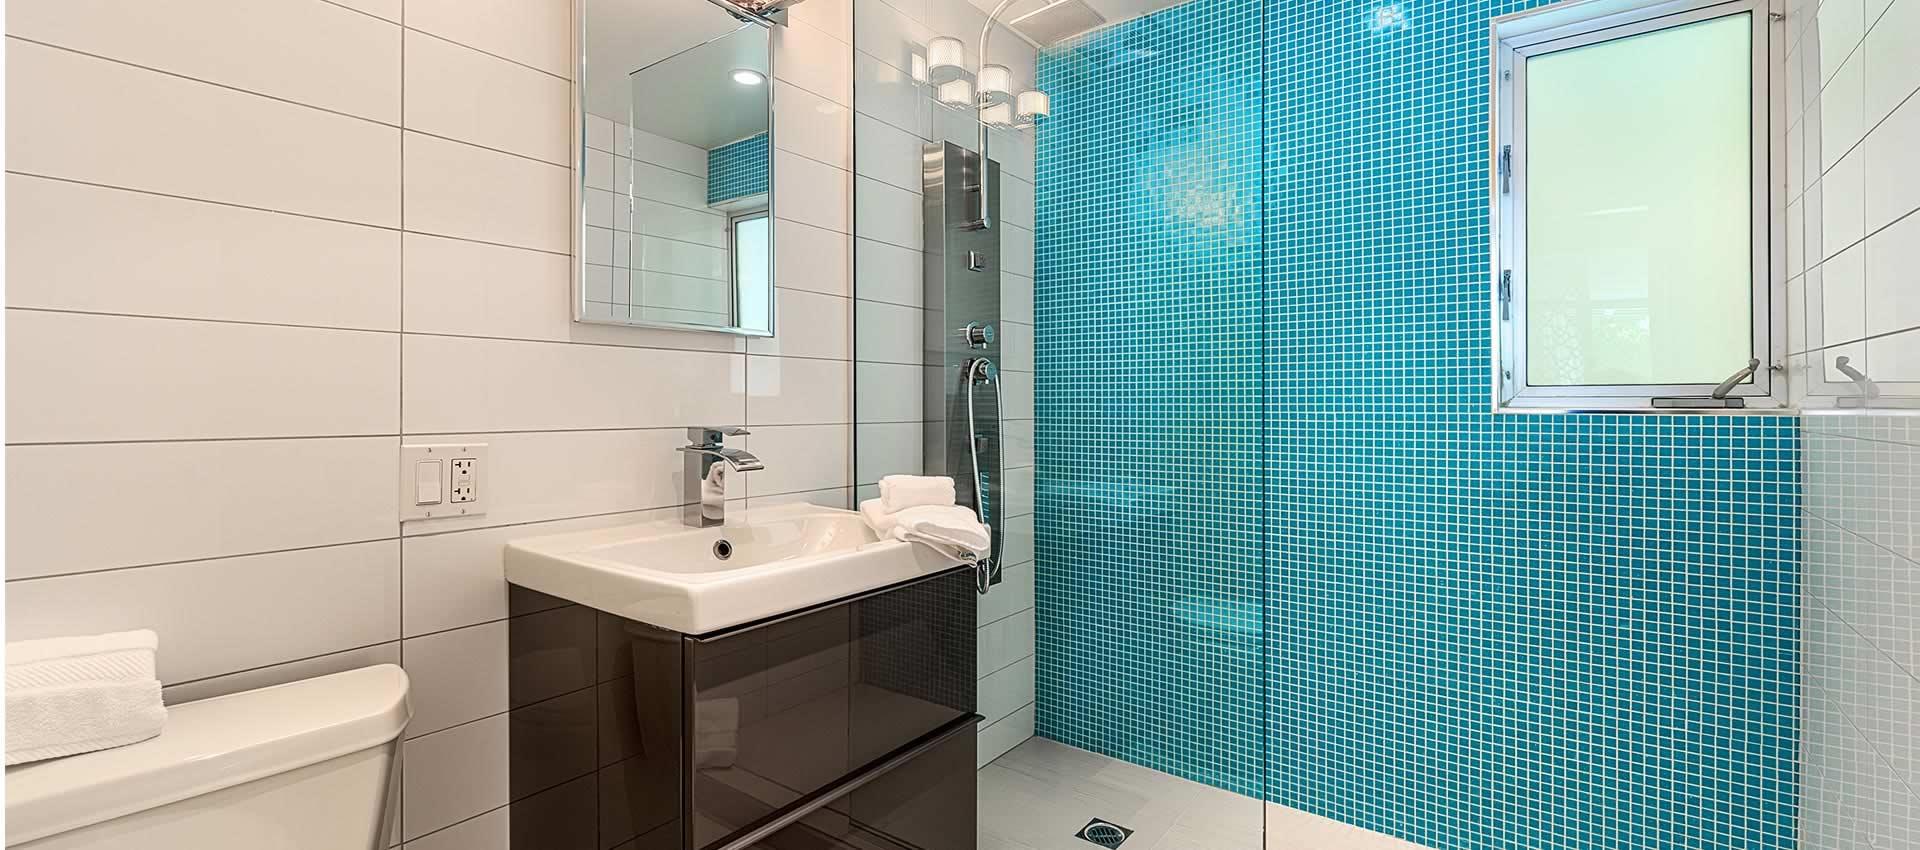 twist hotel studio room bright modern bathroom teal shower